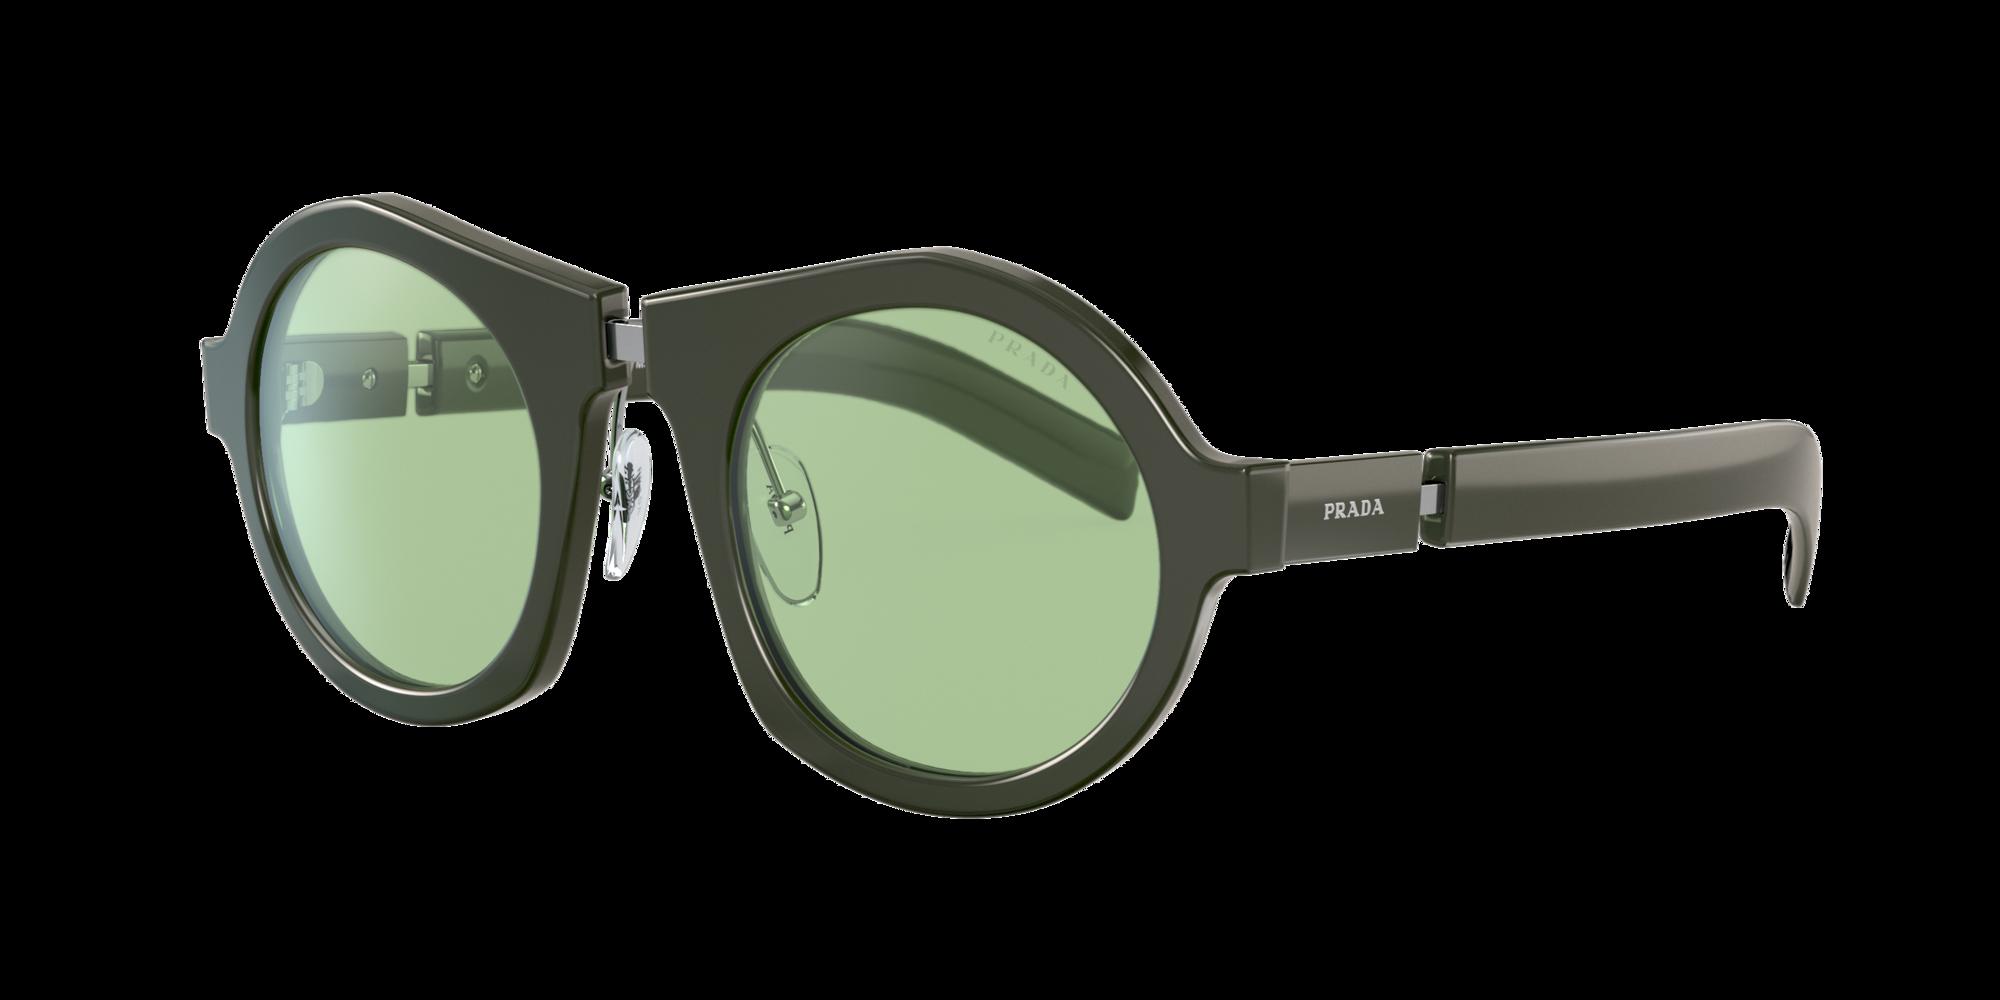 Prada Unisex  PR 10XS -  Frame color: Vert, Lens color: Vert